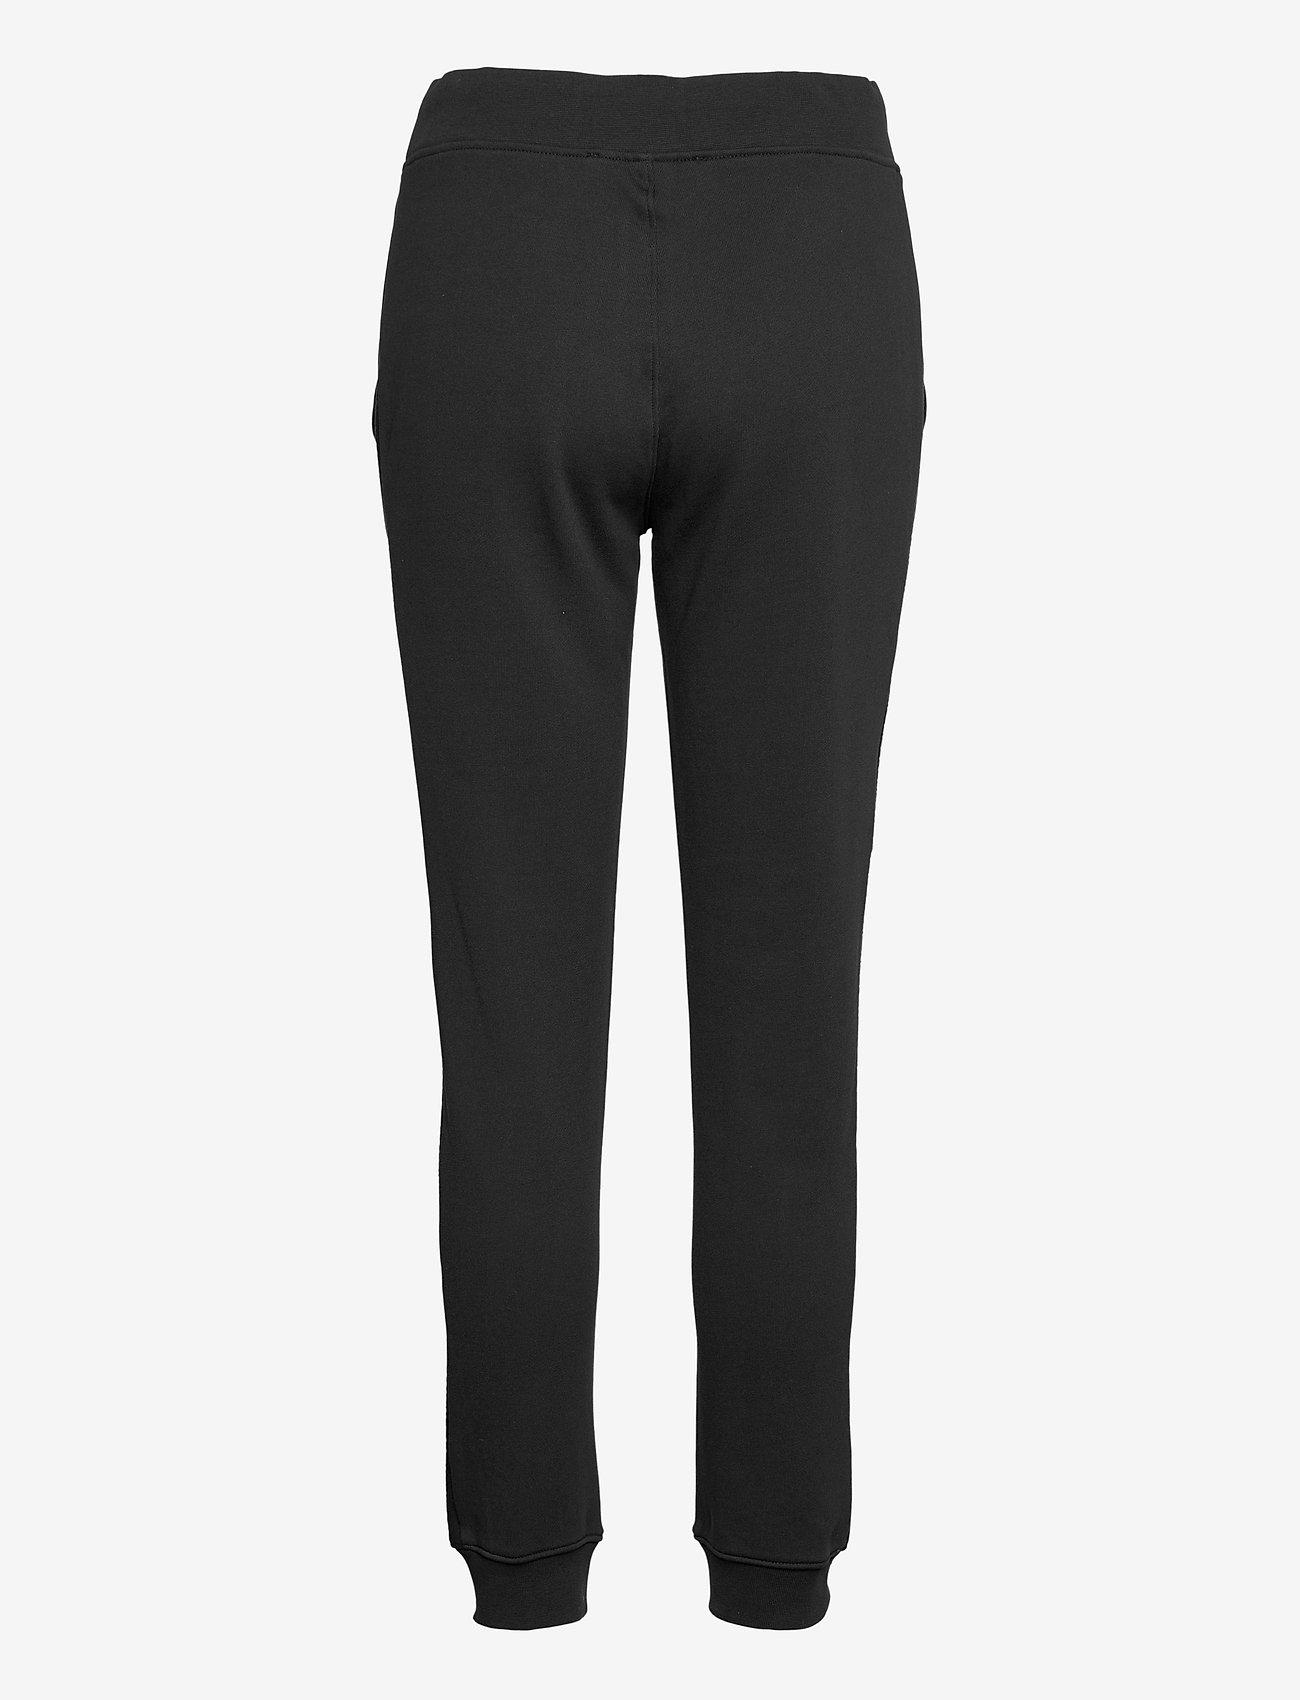 Calvin Klein Jeans - LOGO TRIM JOGGING PANT - klær - ck black - 1